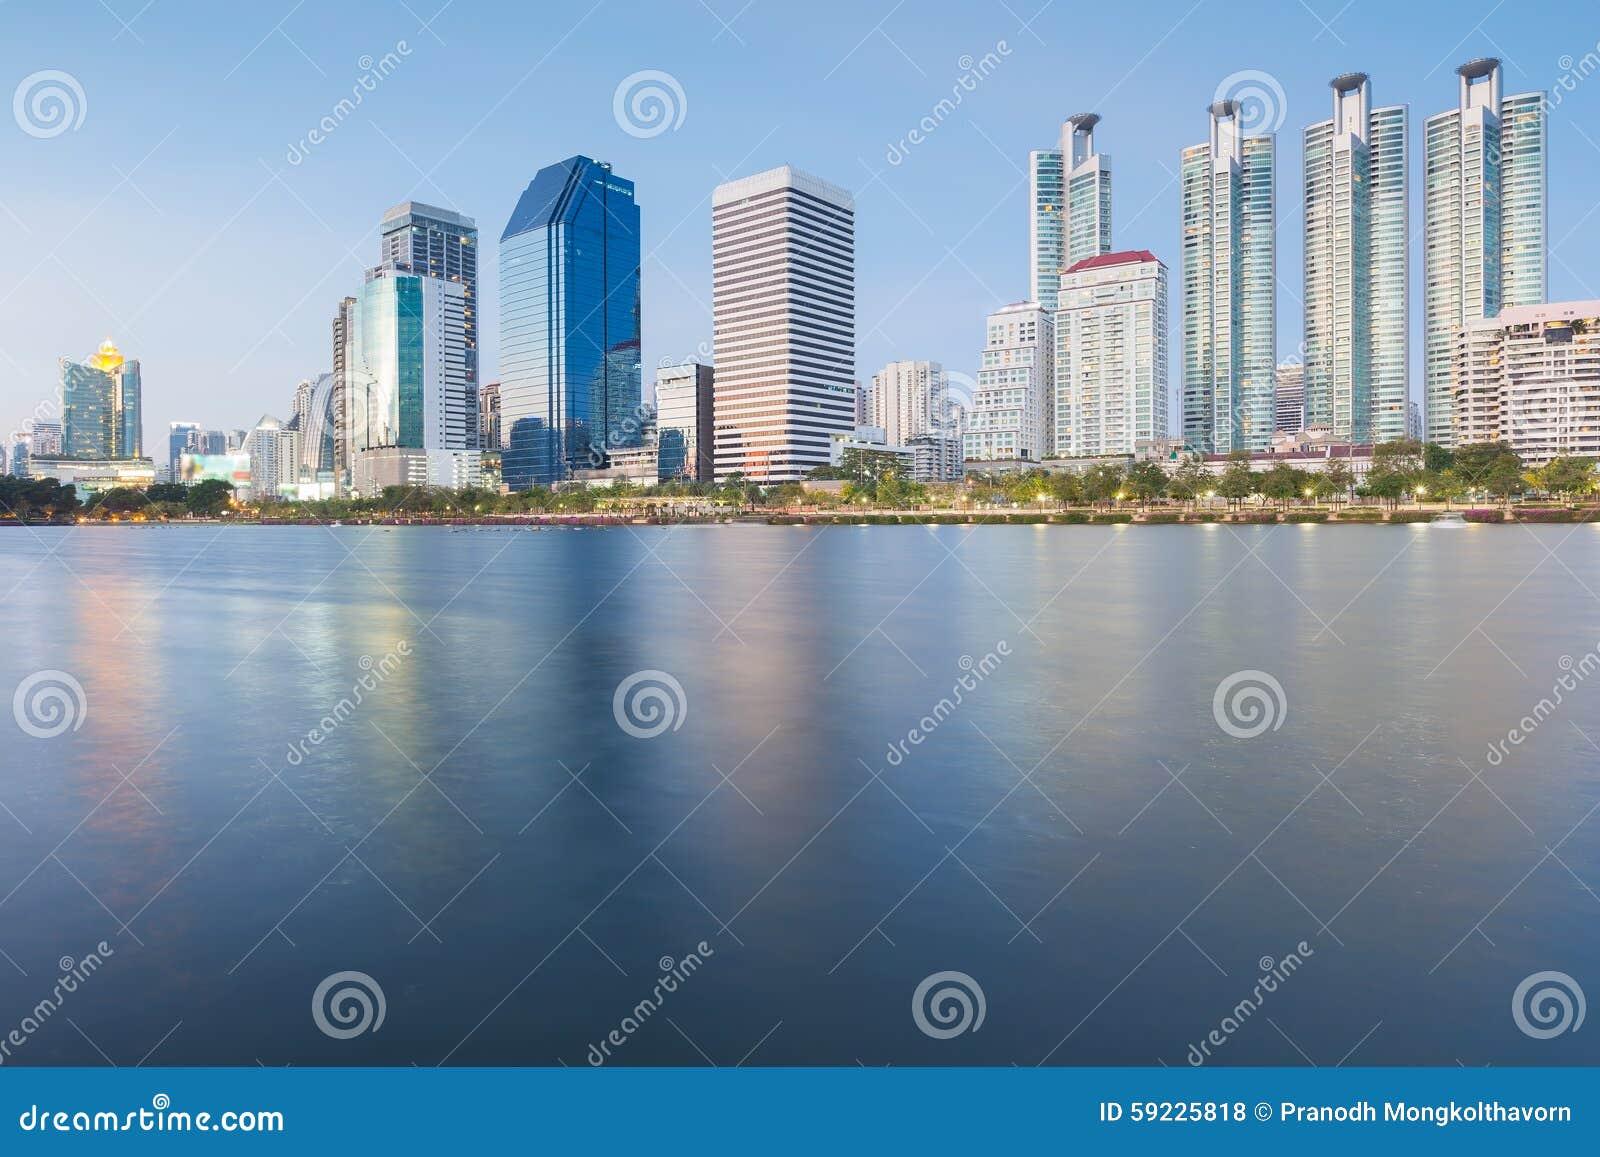 Vue de face de l eau de ville de Bangkok en parcs publics